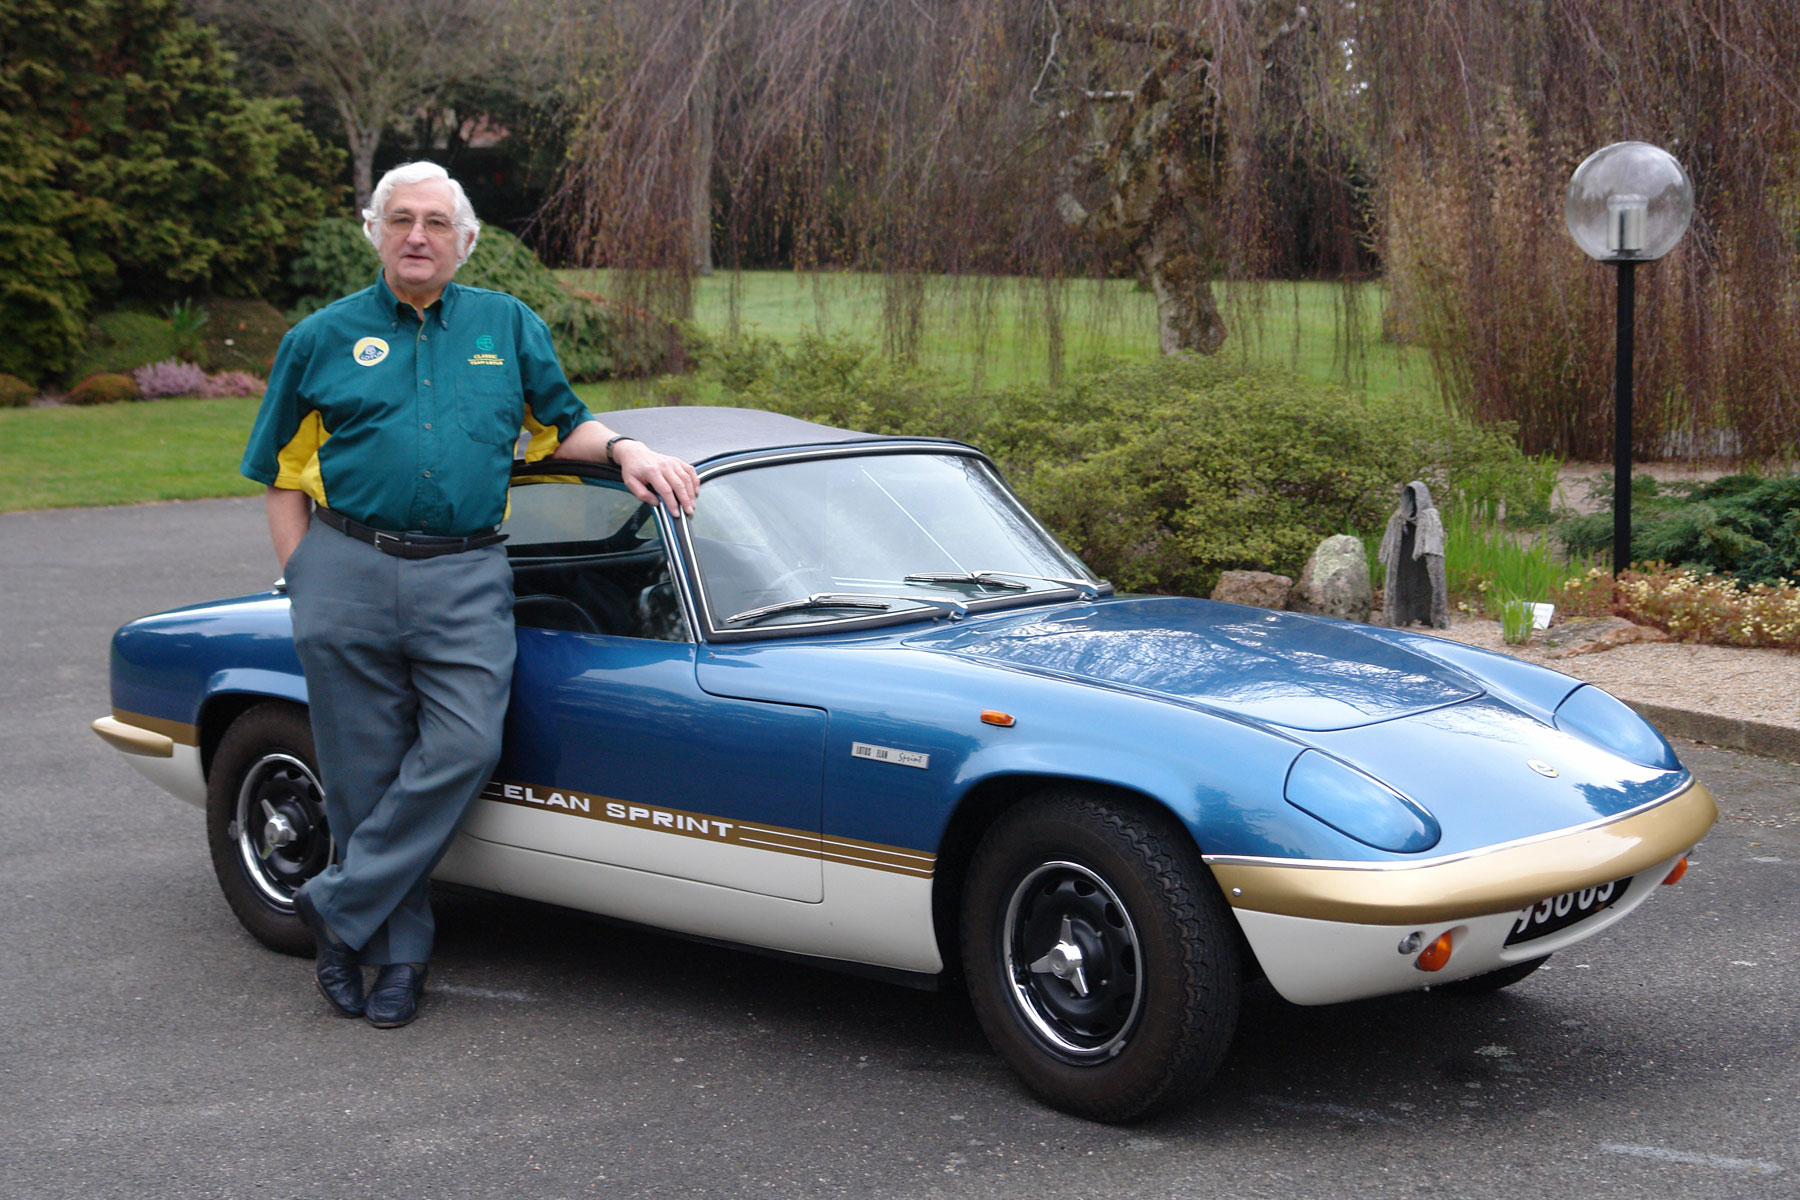 Ron Hickman with Lotus Elan Sprint